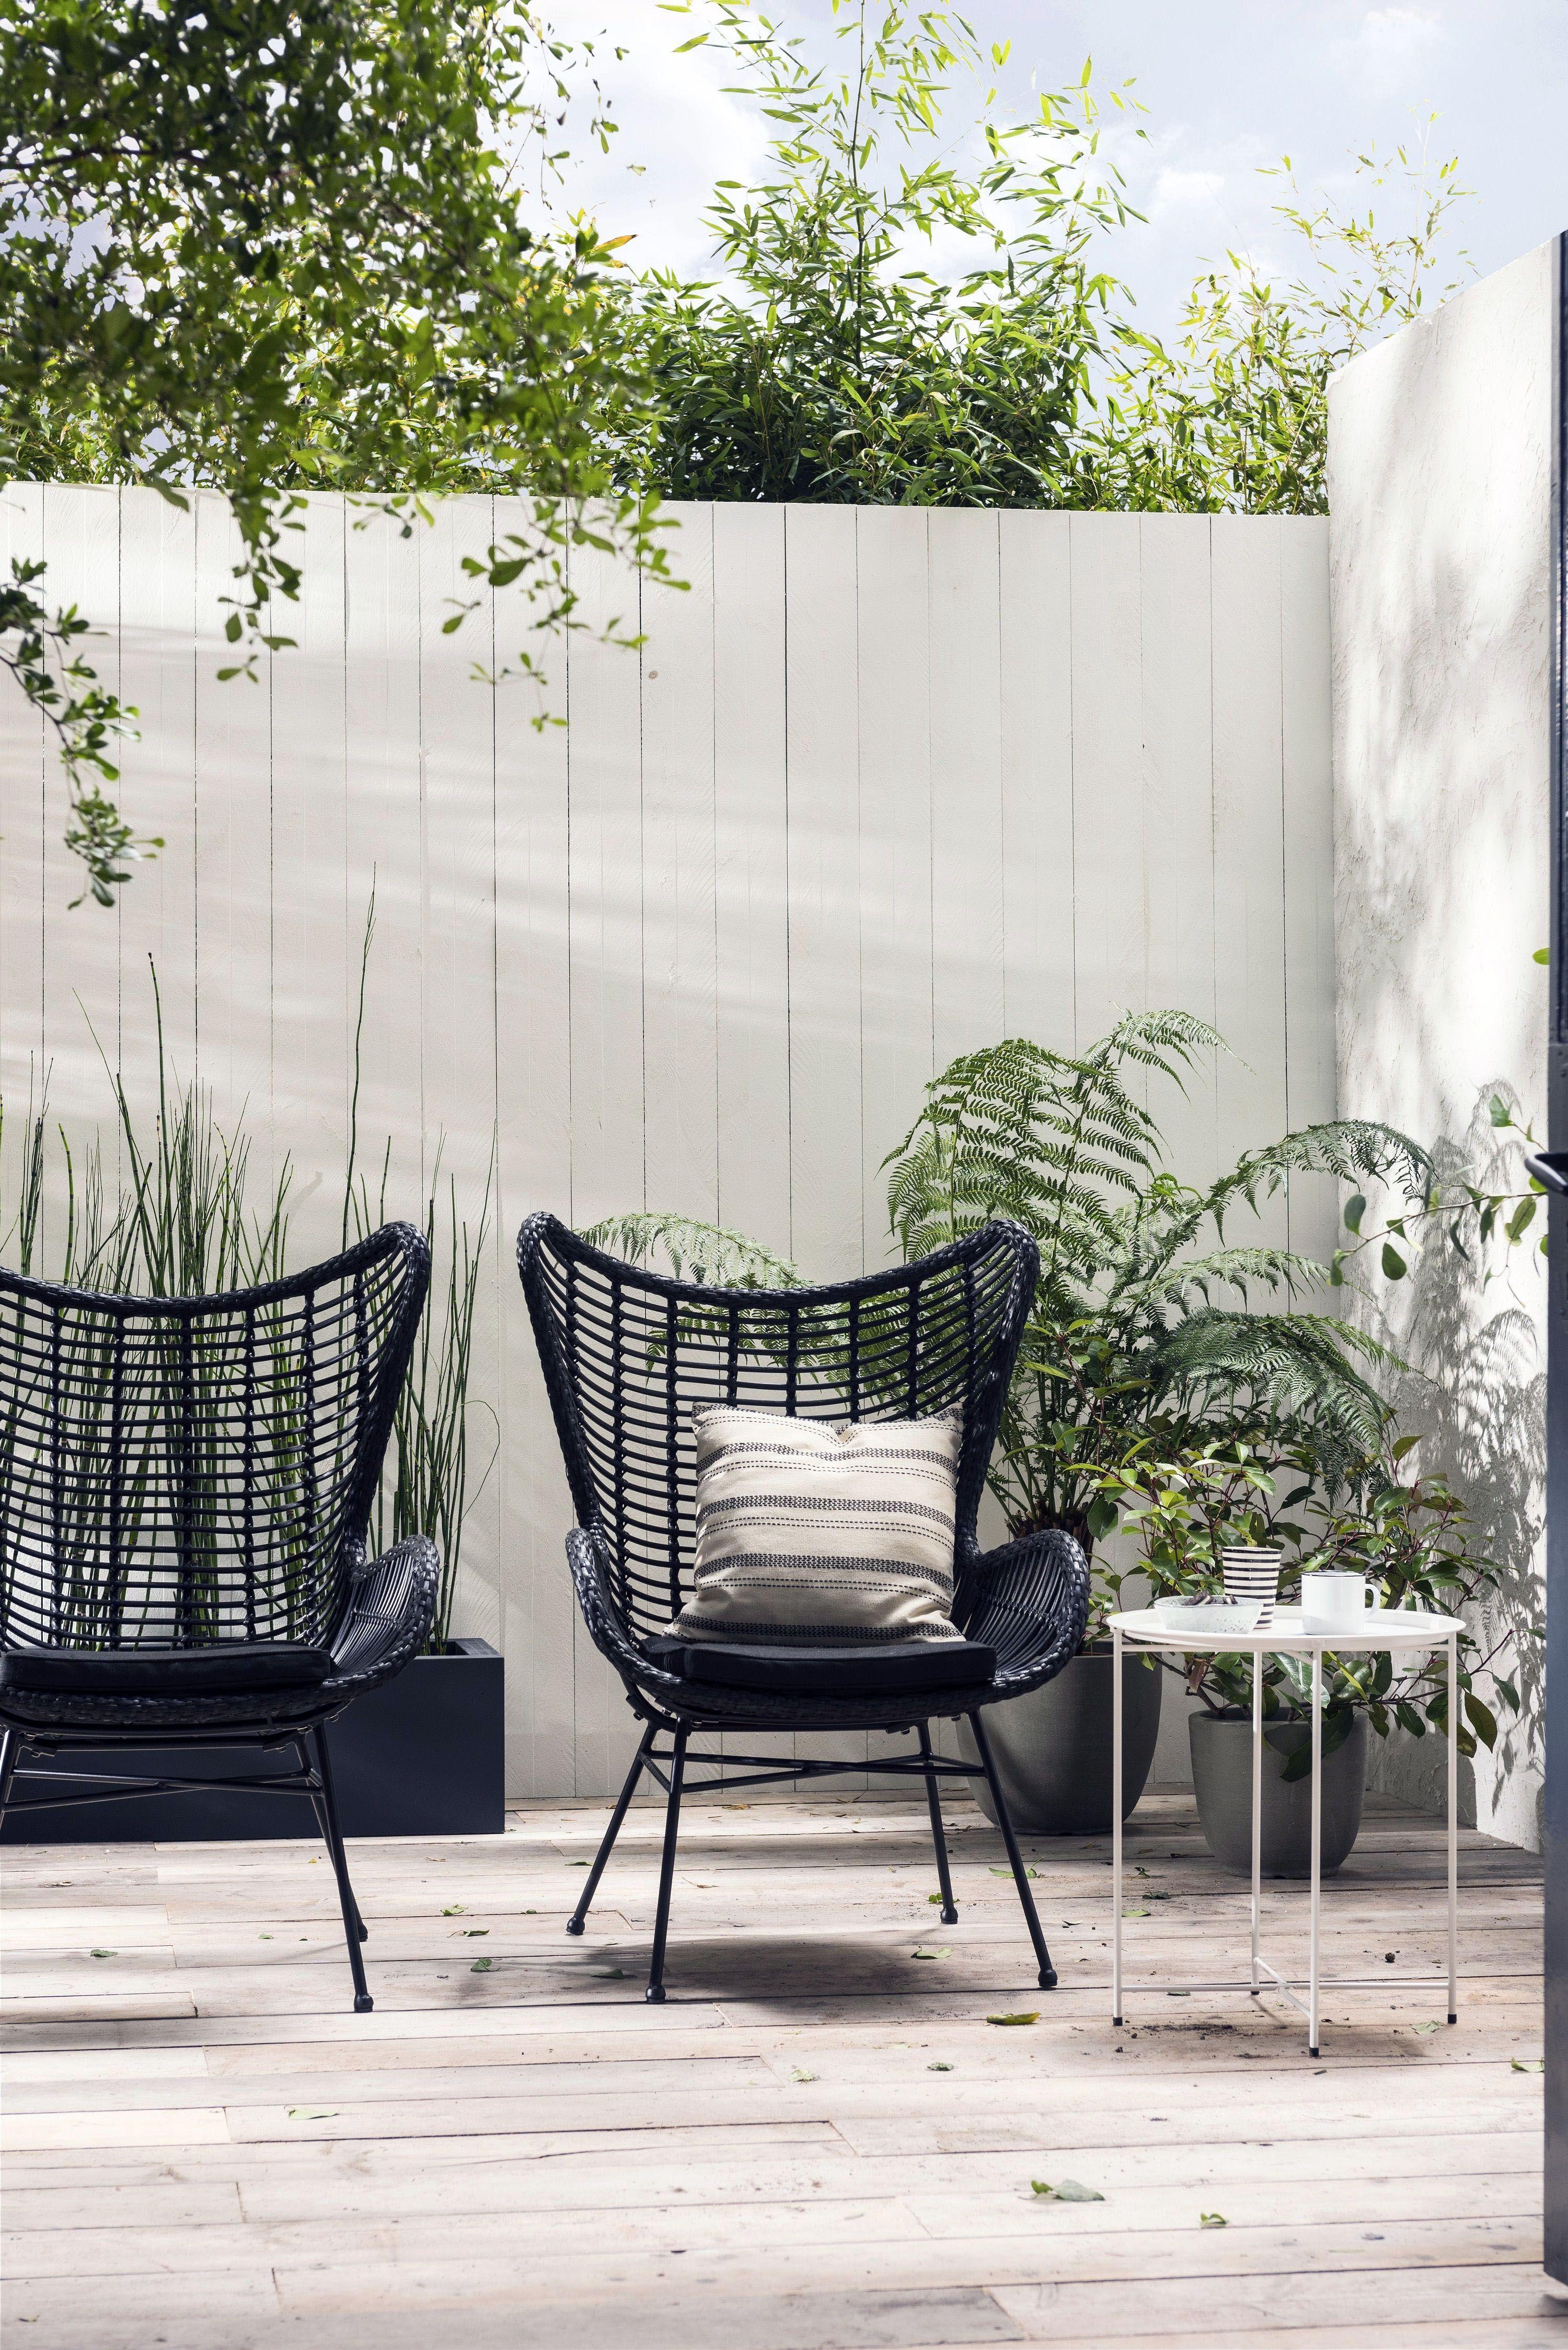 Here S The Easiest Way To Create The Best Balcony Urban Garden Design Urban Garden Garden Chairs